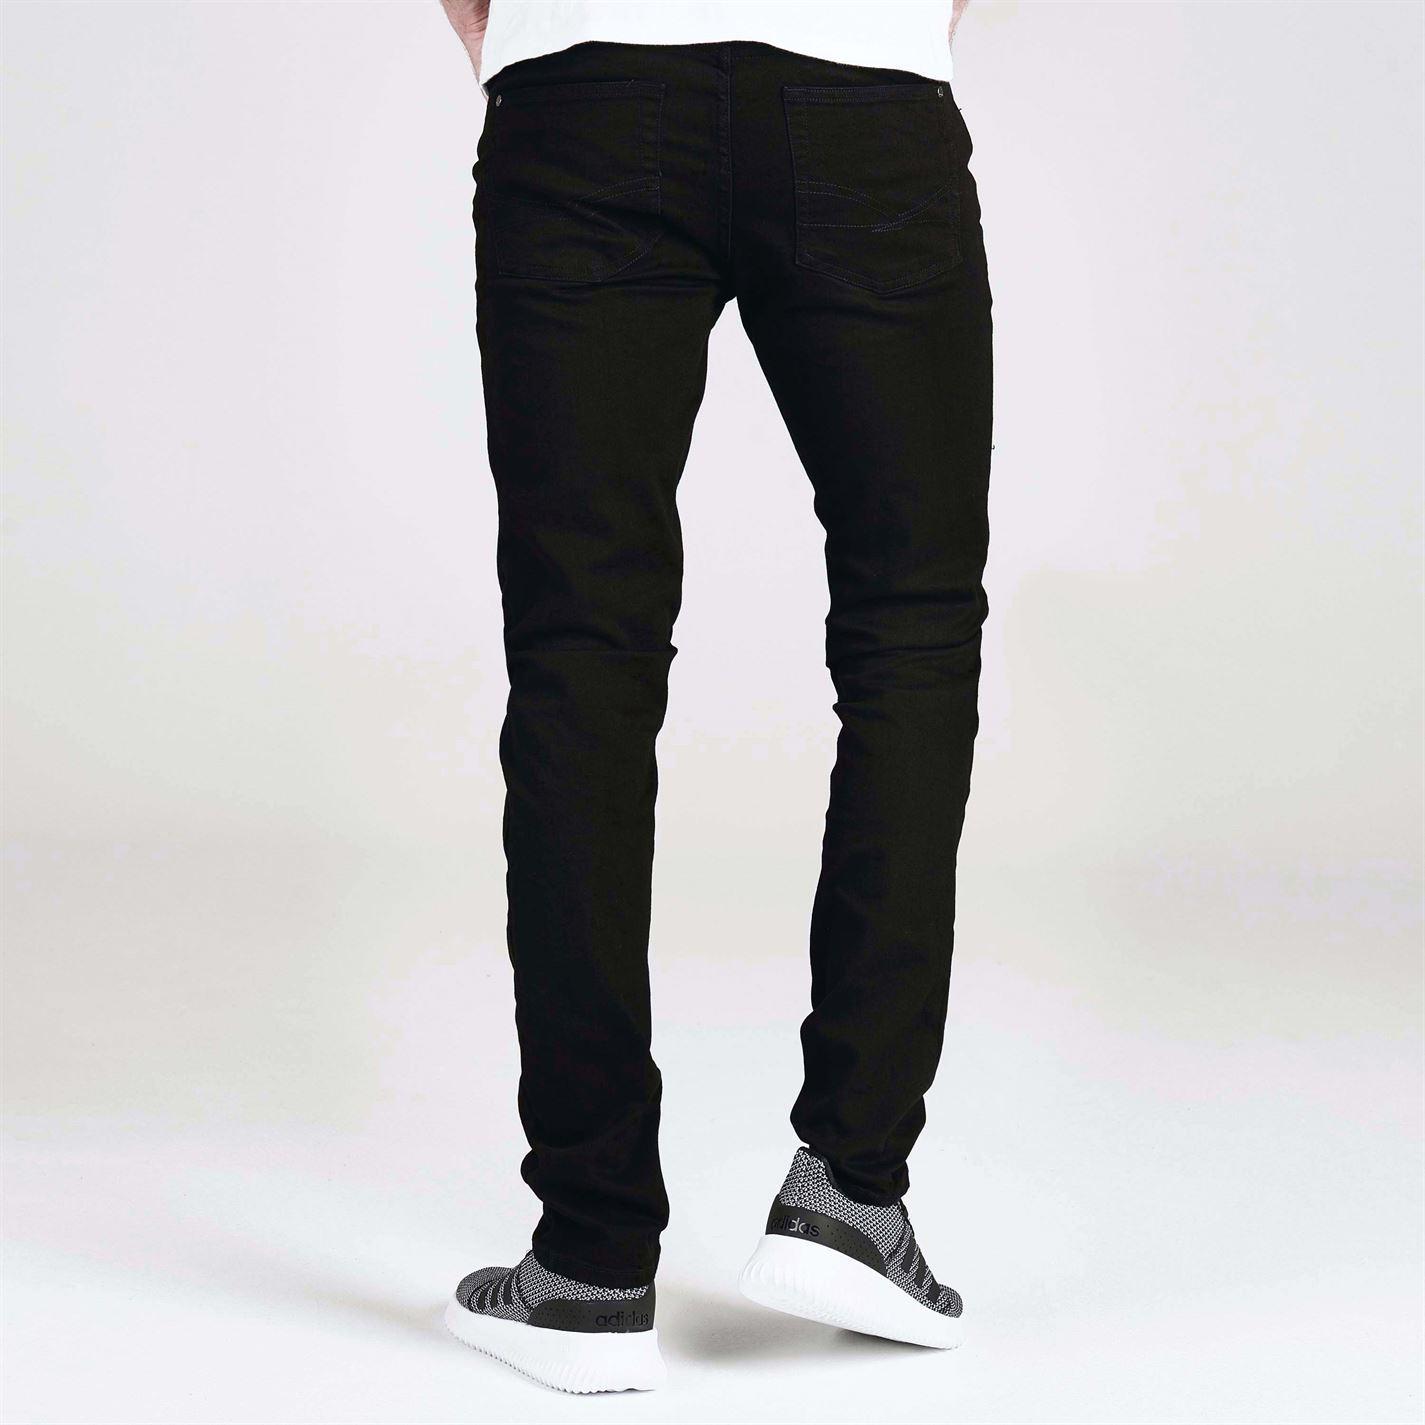 Jeans-Denim-Firetrap-Skinny-Mens-Trouser-Black thumbnail 13